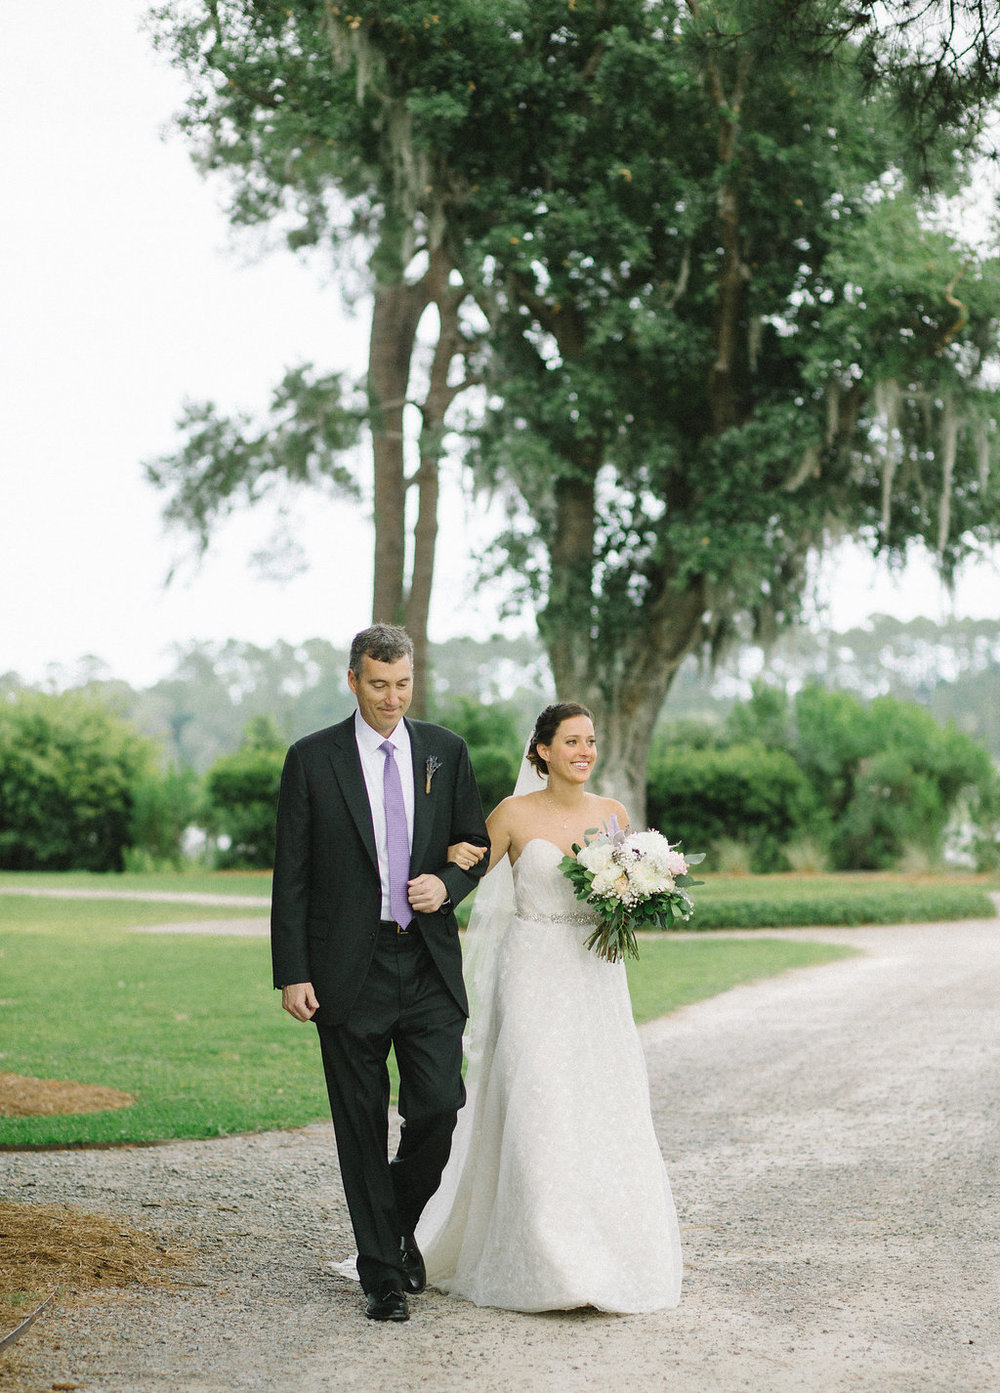 meagan-and-brenden-rach-loves-troy-photography-ivory-and-beau-bridal-boutqiue-ti-adora-wedding-dress-gold-lace-wedding-dress-savannah-wedding-planner-savannah-weddings-oldfield-plantation-wedding-savannah-florist-72.jpg